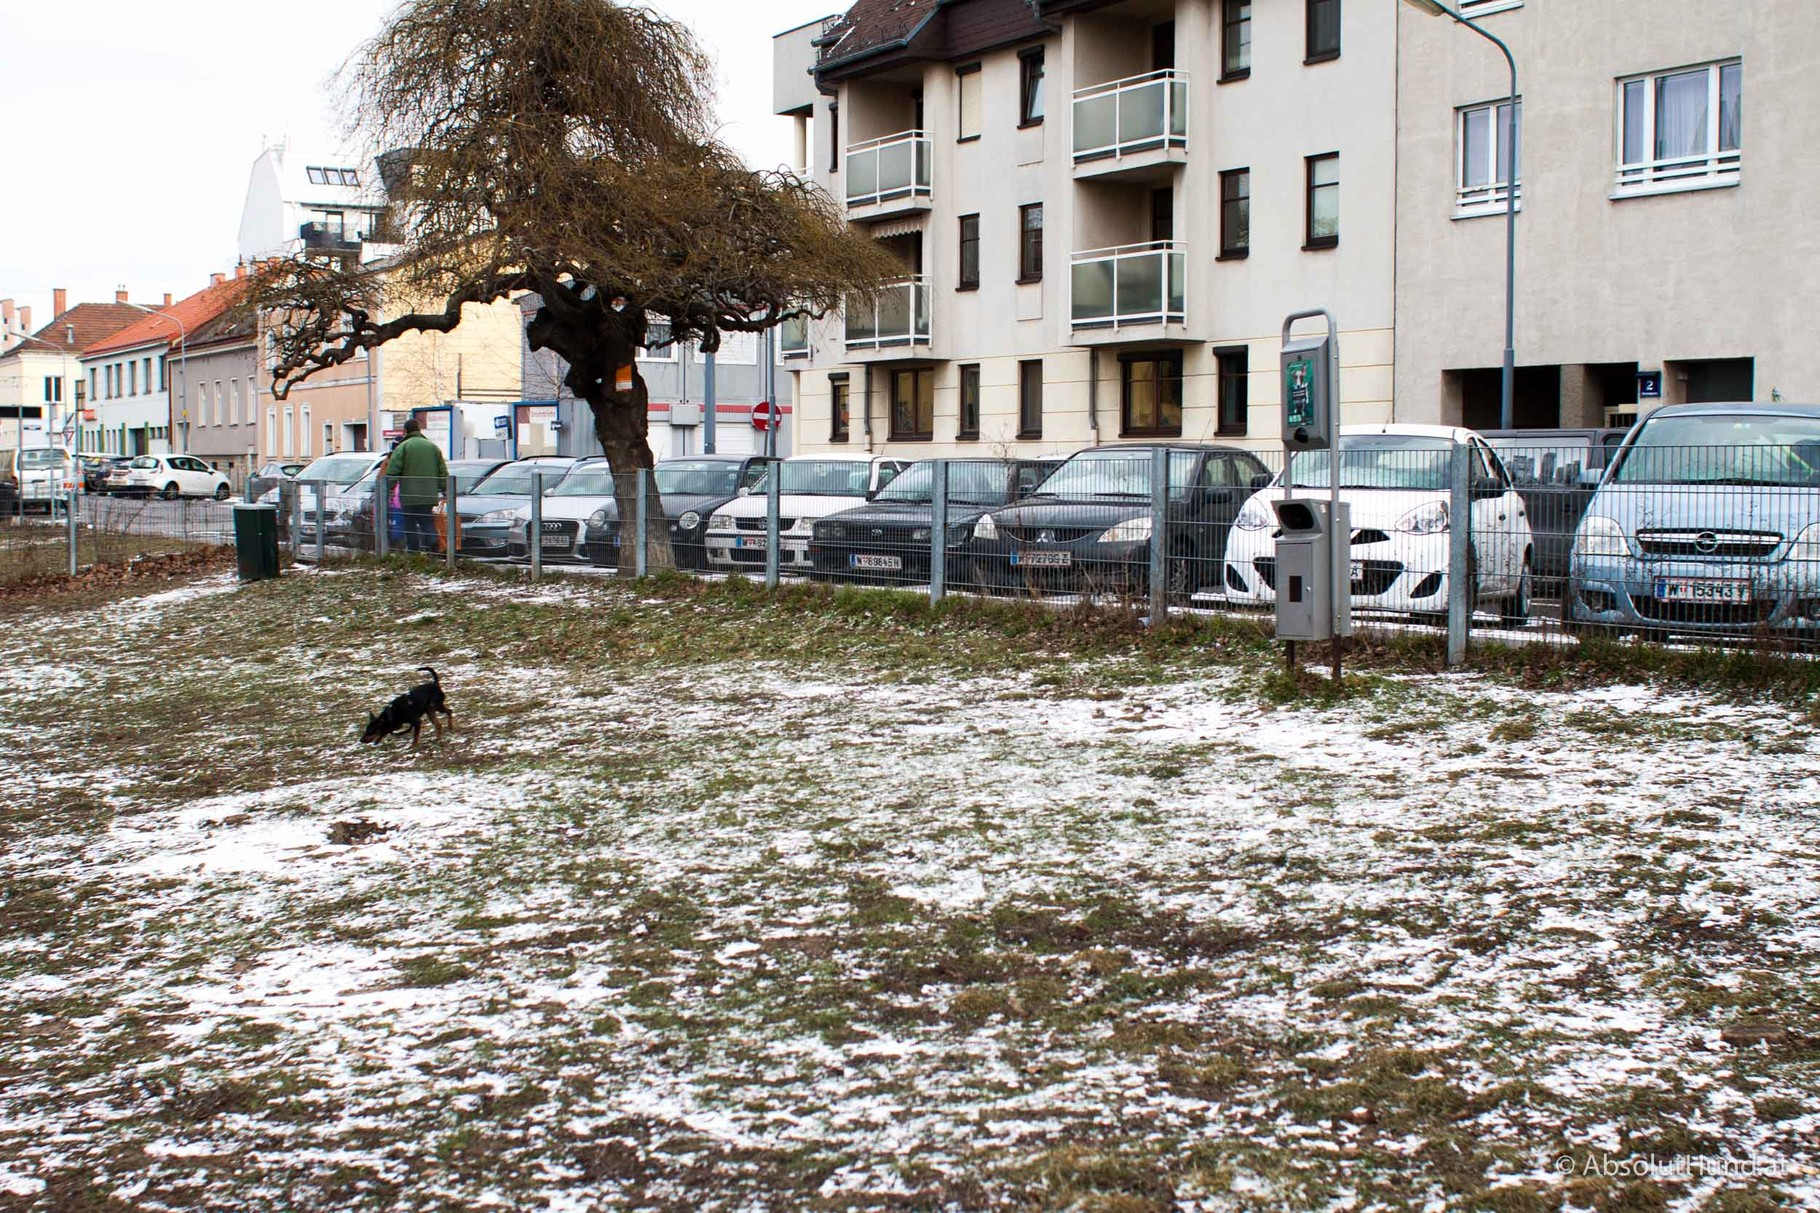 Hundezone -Schrickgasse, 1220 Wien